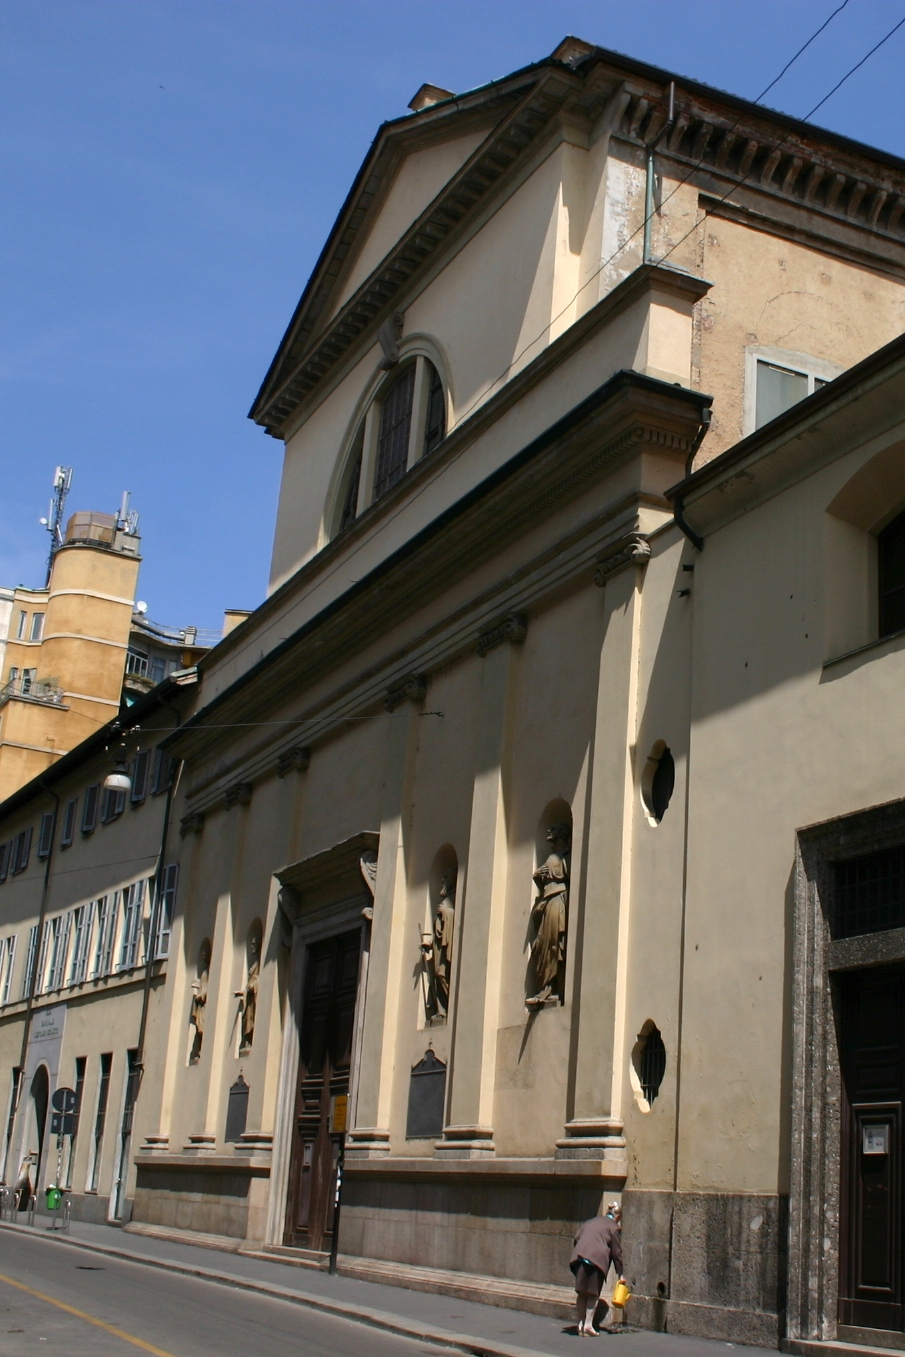 Chiesa di sant 39 antonio abate milano wikipedia for Arredo bimbo sant antonio abate